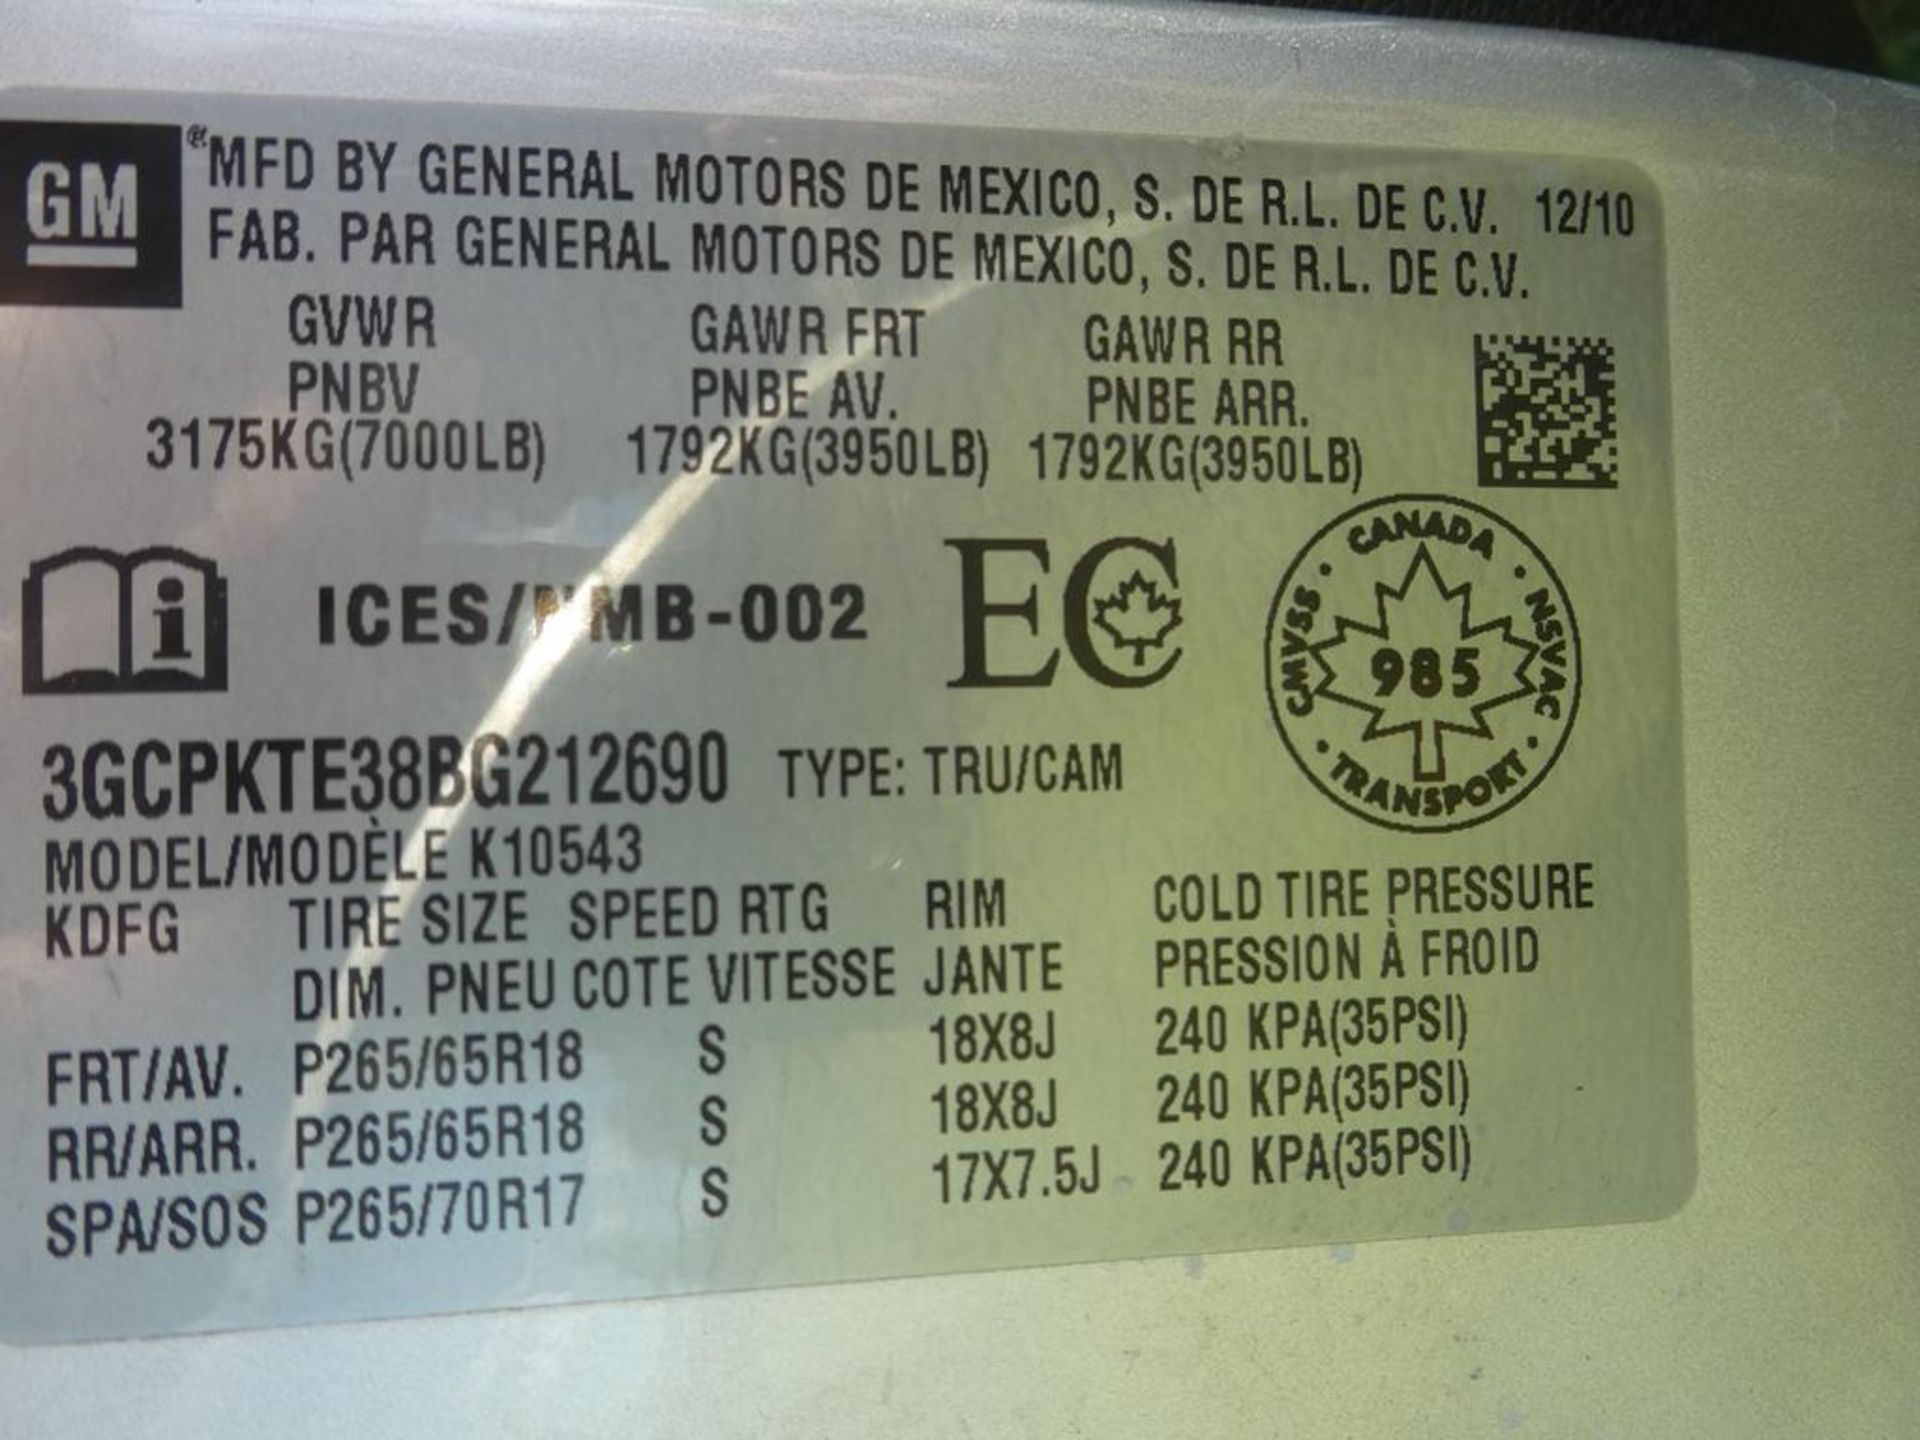 Lot 176 - 2011 Chevrolet SILVERADO Z71 CREW CAB SB 4X4 TRUCK VIN: 3GCPKTE38BG212690Engine: 5.3LColor: